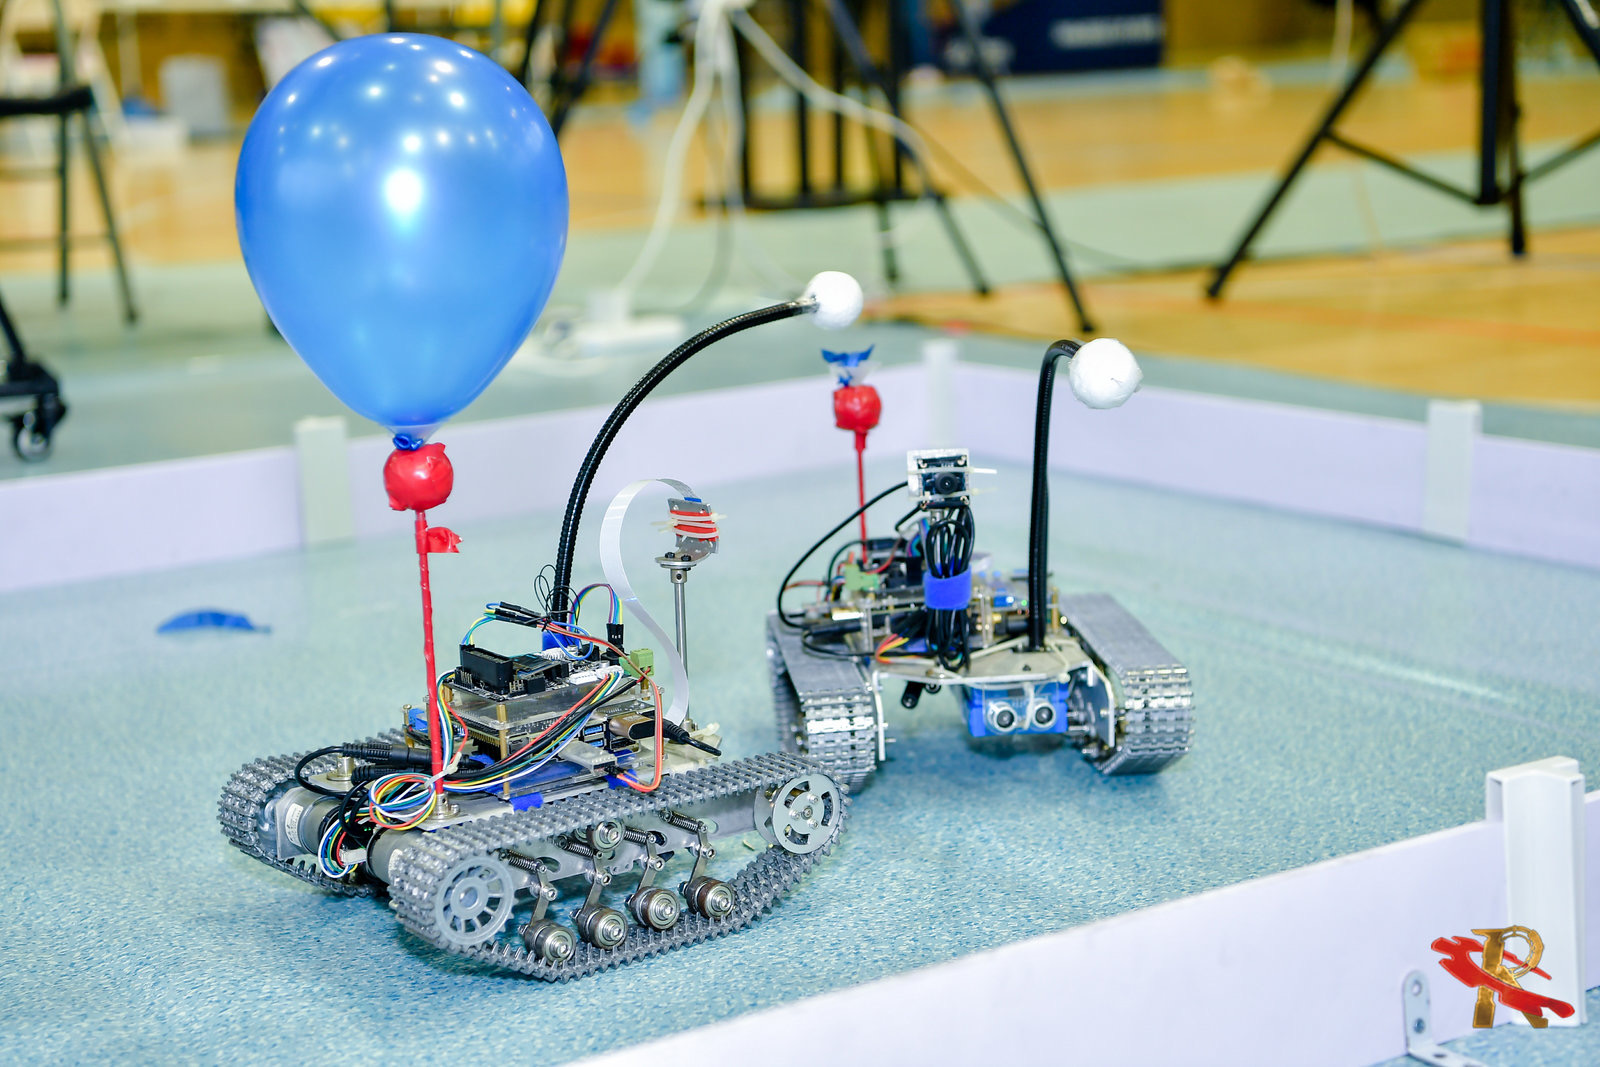 projekte-2019-robot_comp-tongji-vorschau.JPG